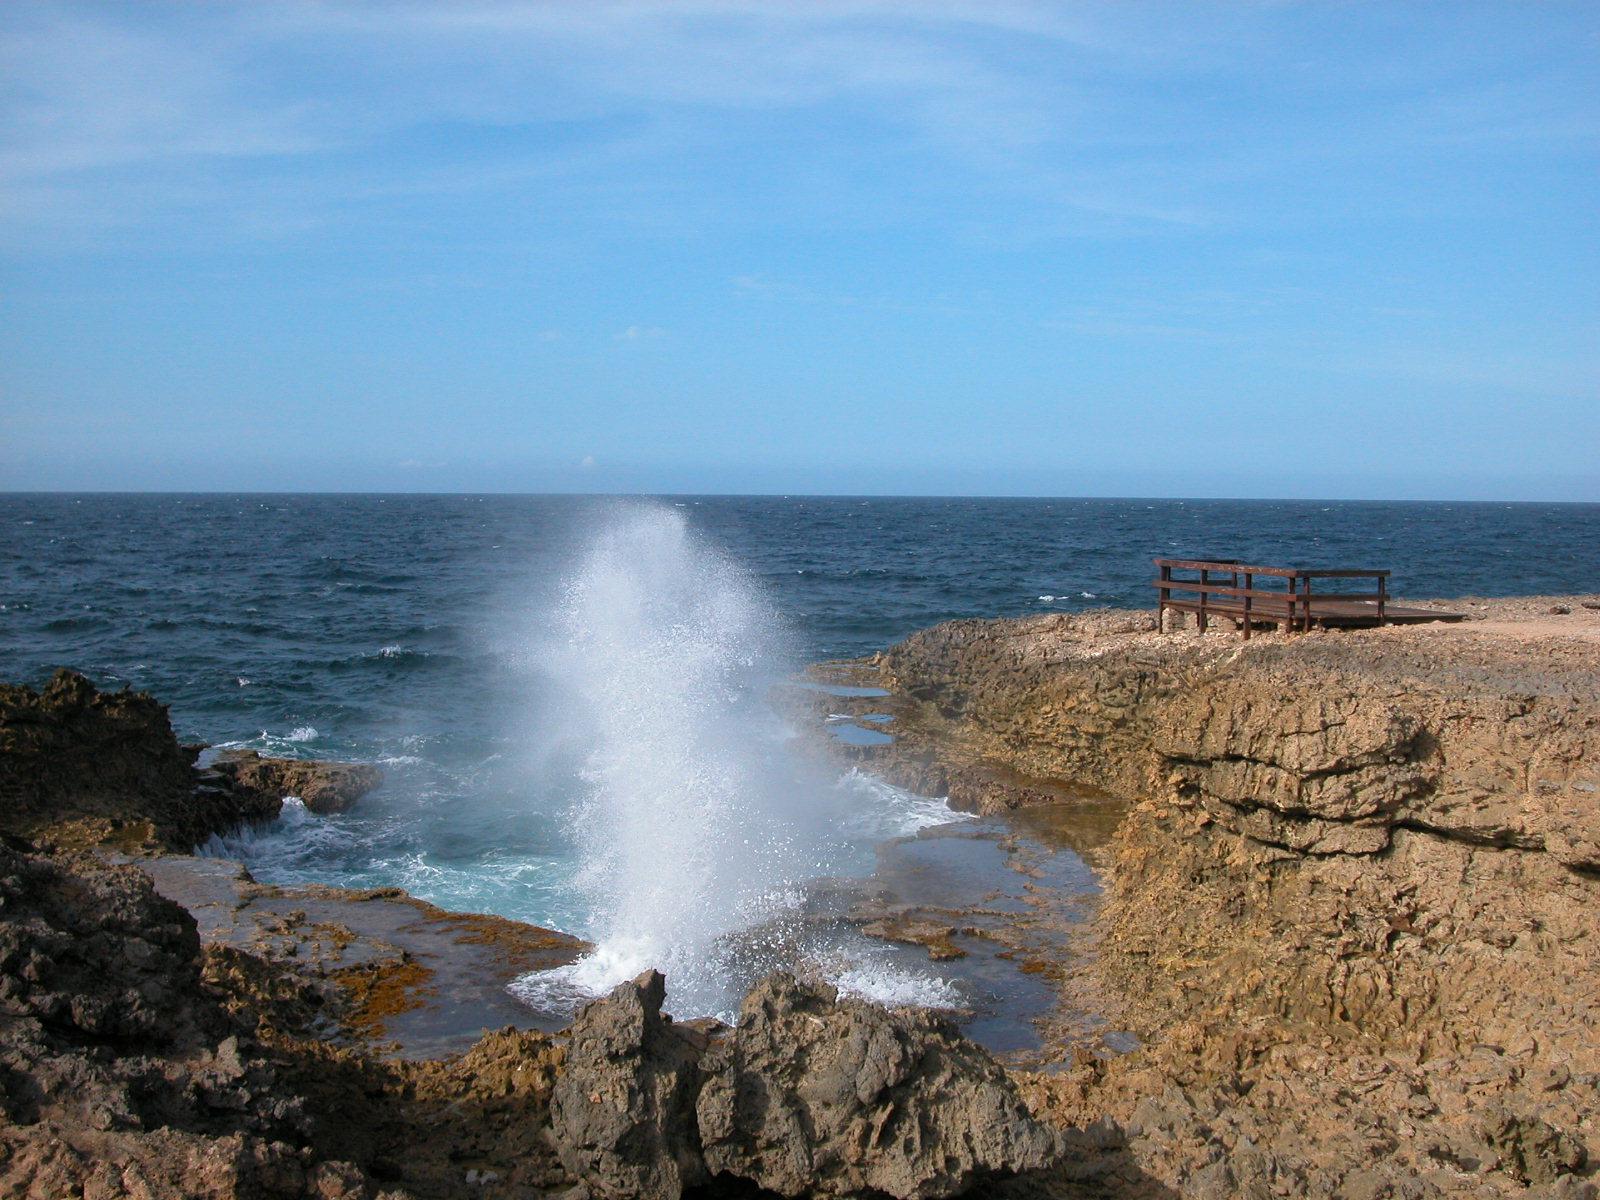 braking wave waves ocean sea nature landscapes curacao jacco coast rock beach water elements fountain